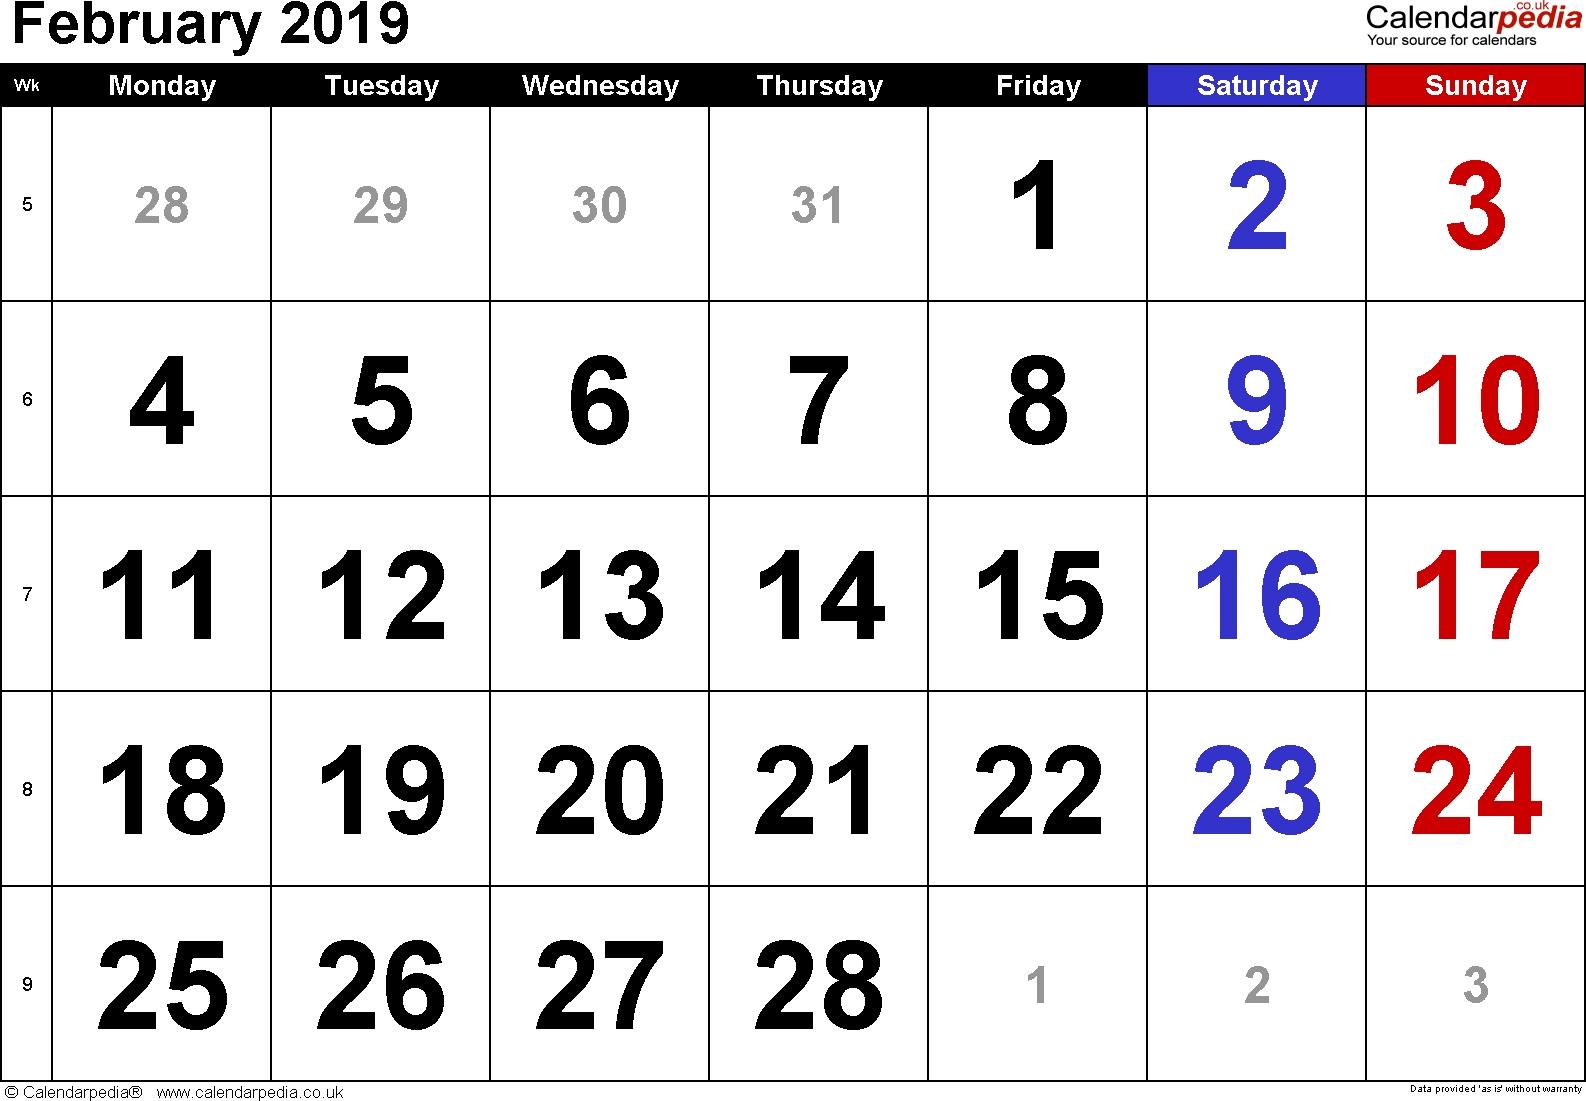 Calendar February 2019 Uk, Bank Holidays, Excel/pdf/word Templates February 1 2019 Calendar